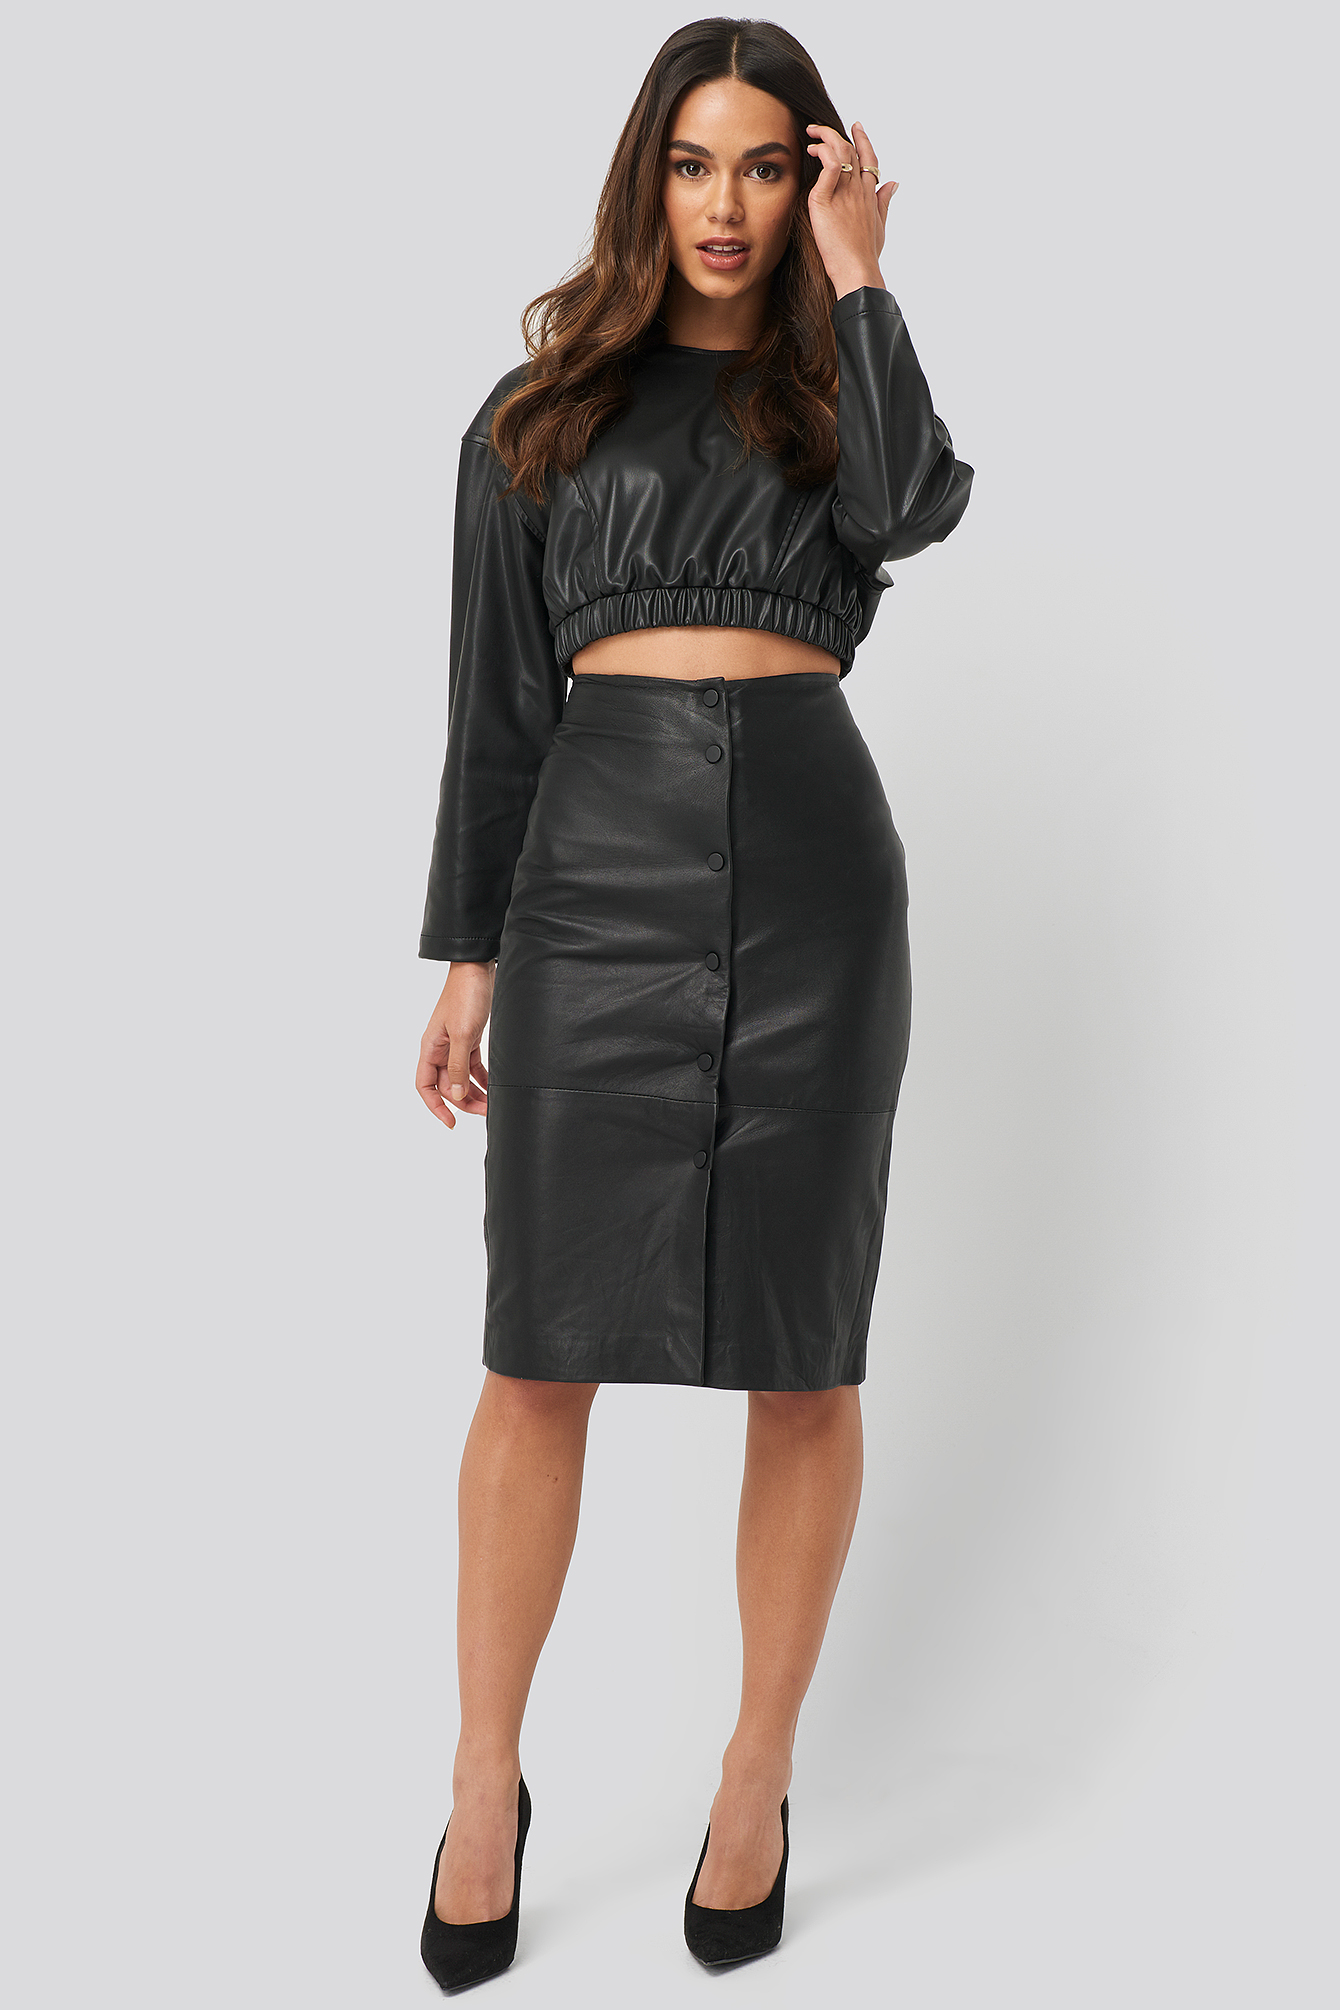 mango -  Silvia Skirt - Black